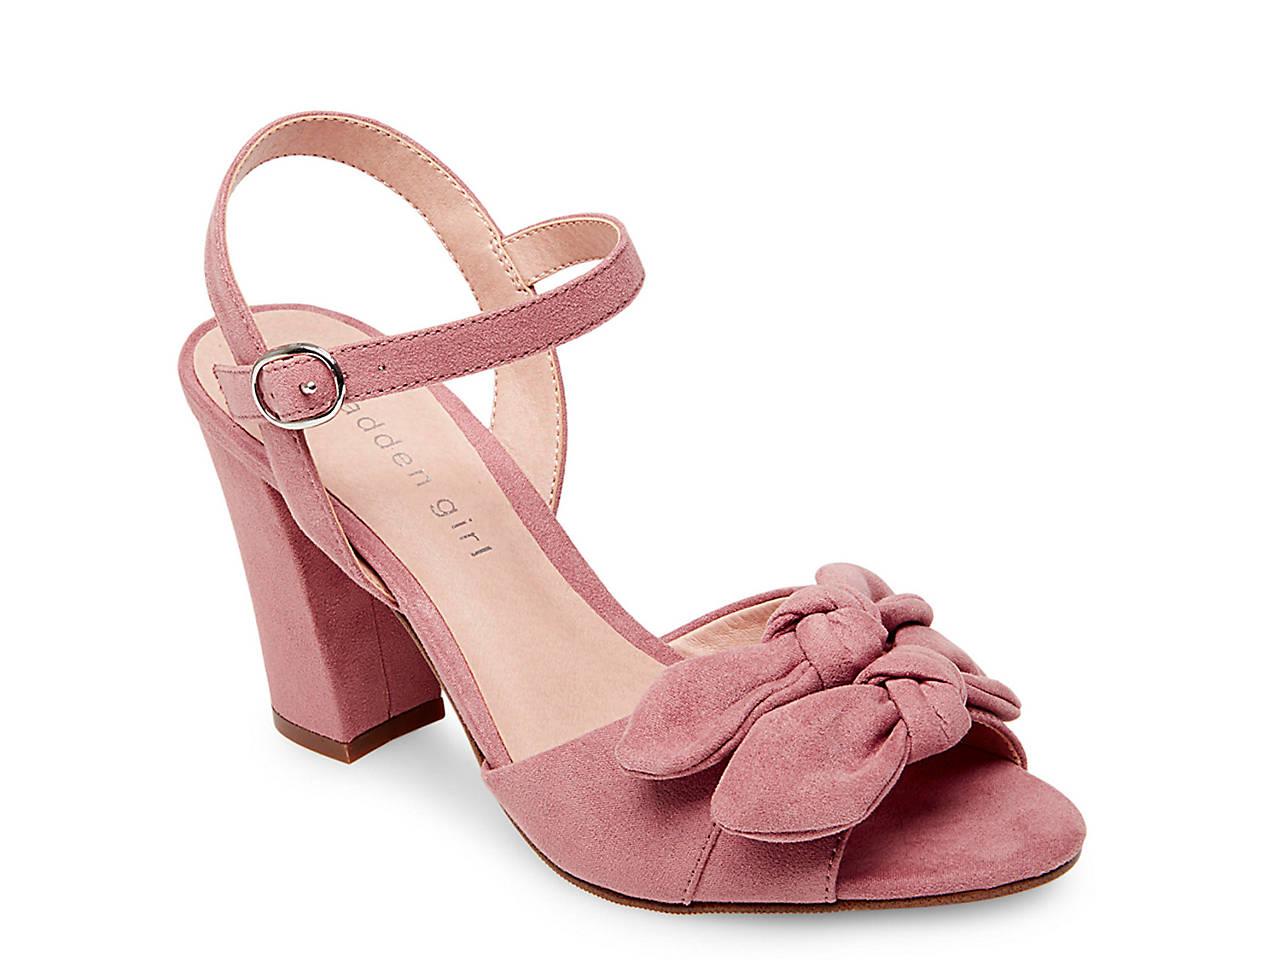 Bows Sandal by Madden Girl